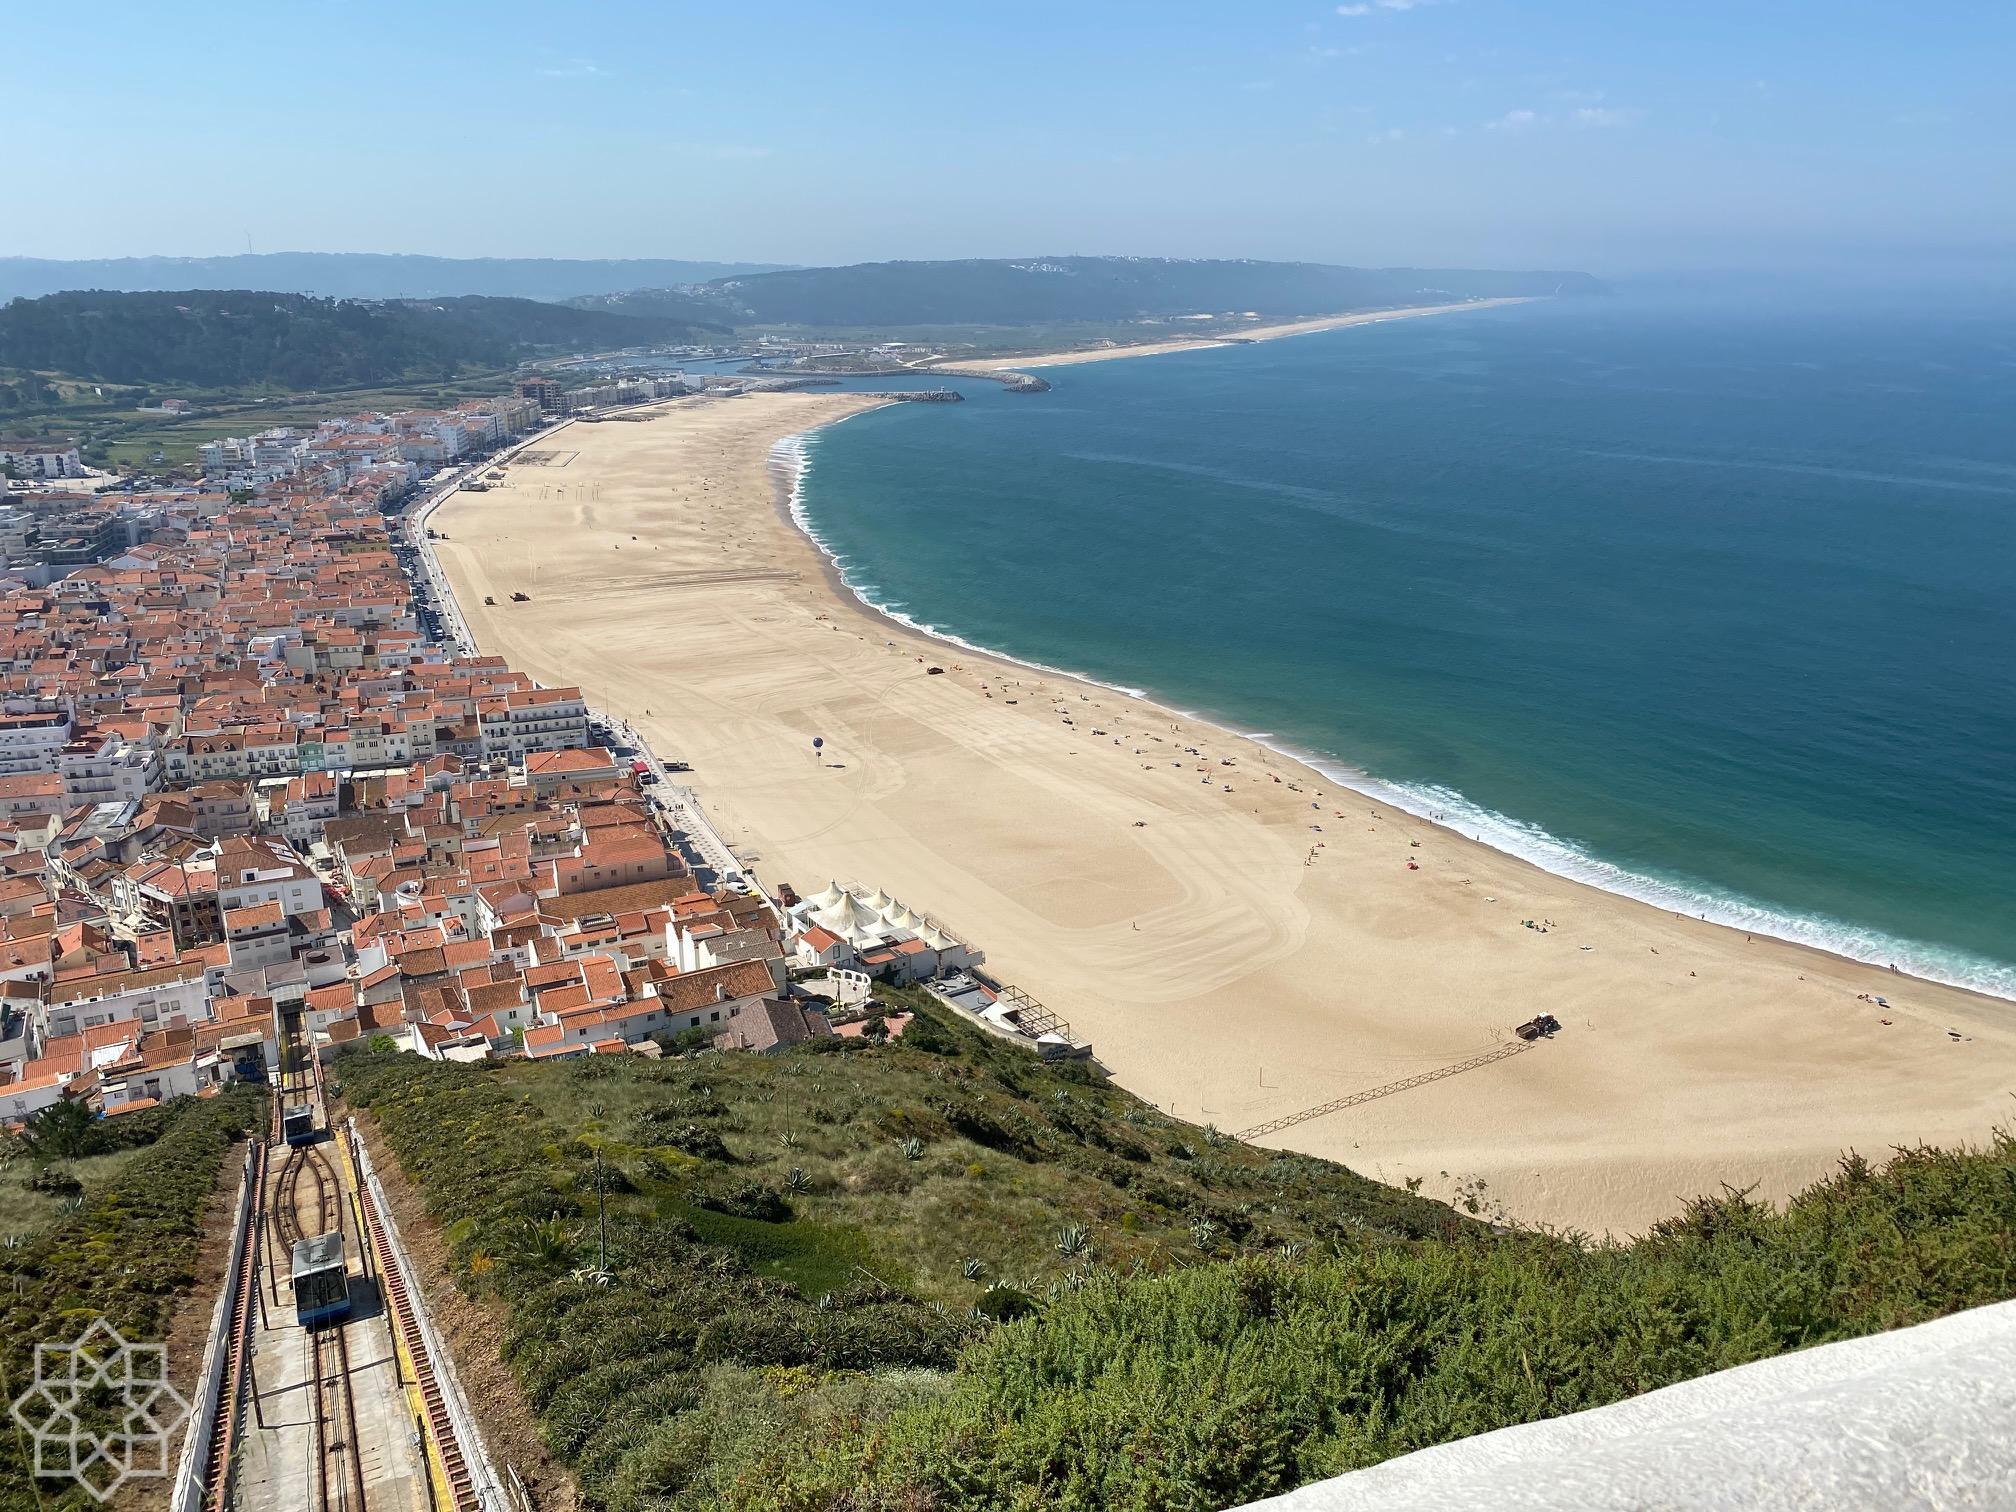 Nazaré beach and the funicular to Sítio May 29 2020